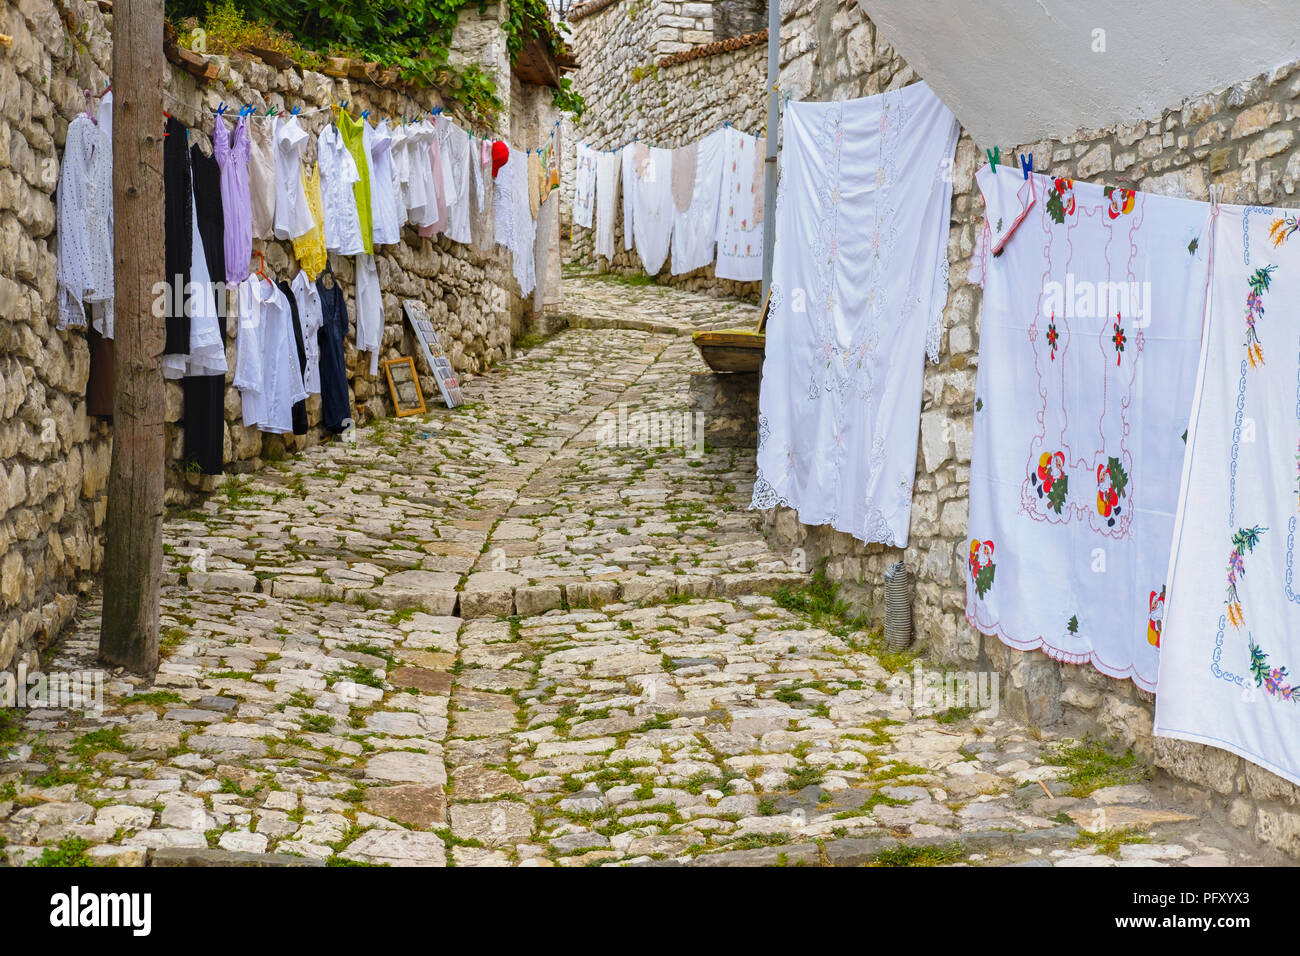 Alley with textile handicrafts, Berat, Qark Berat, Albania - Stock Image